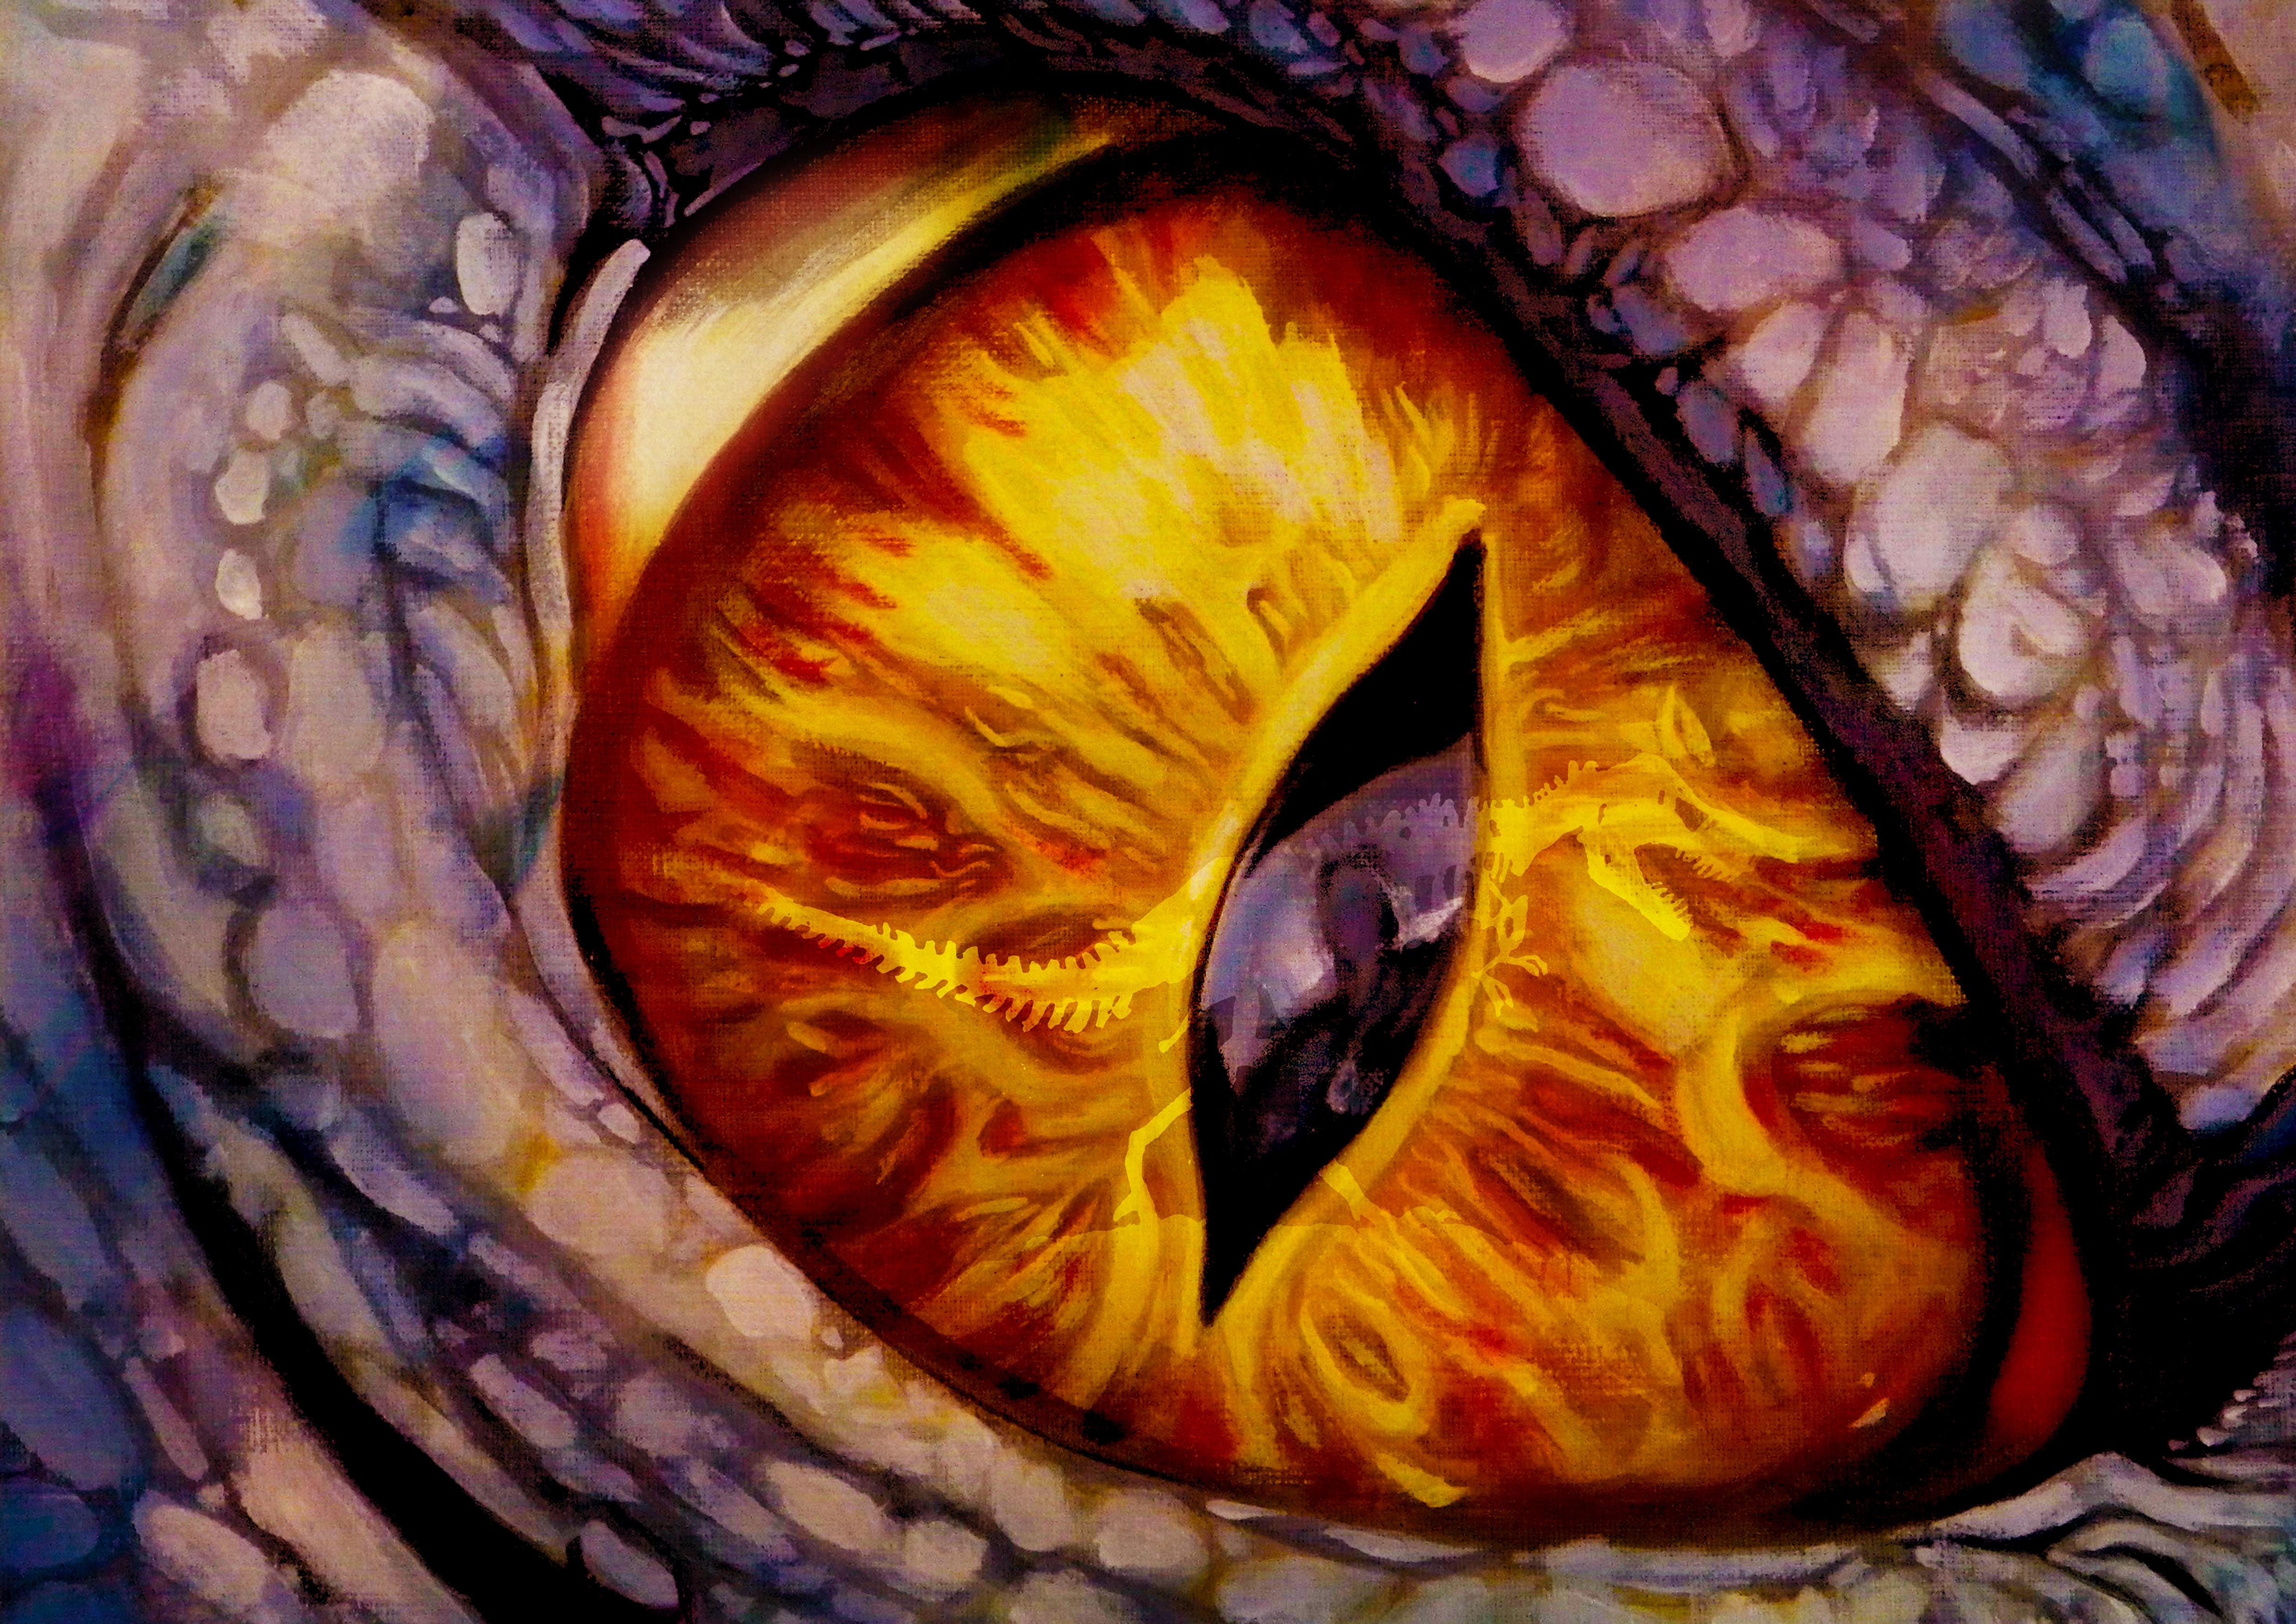 Jurassic Eye